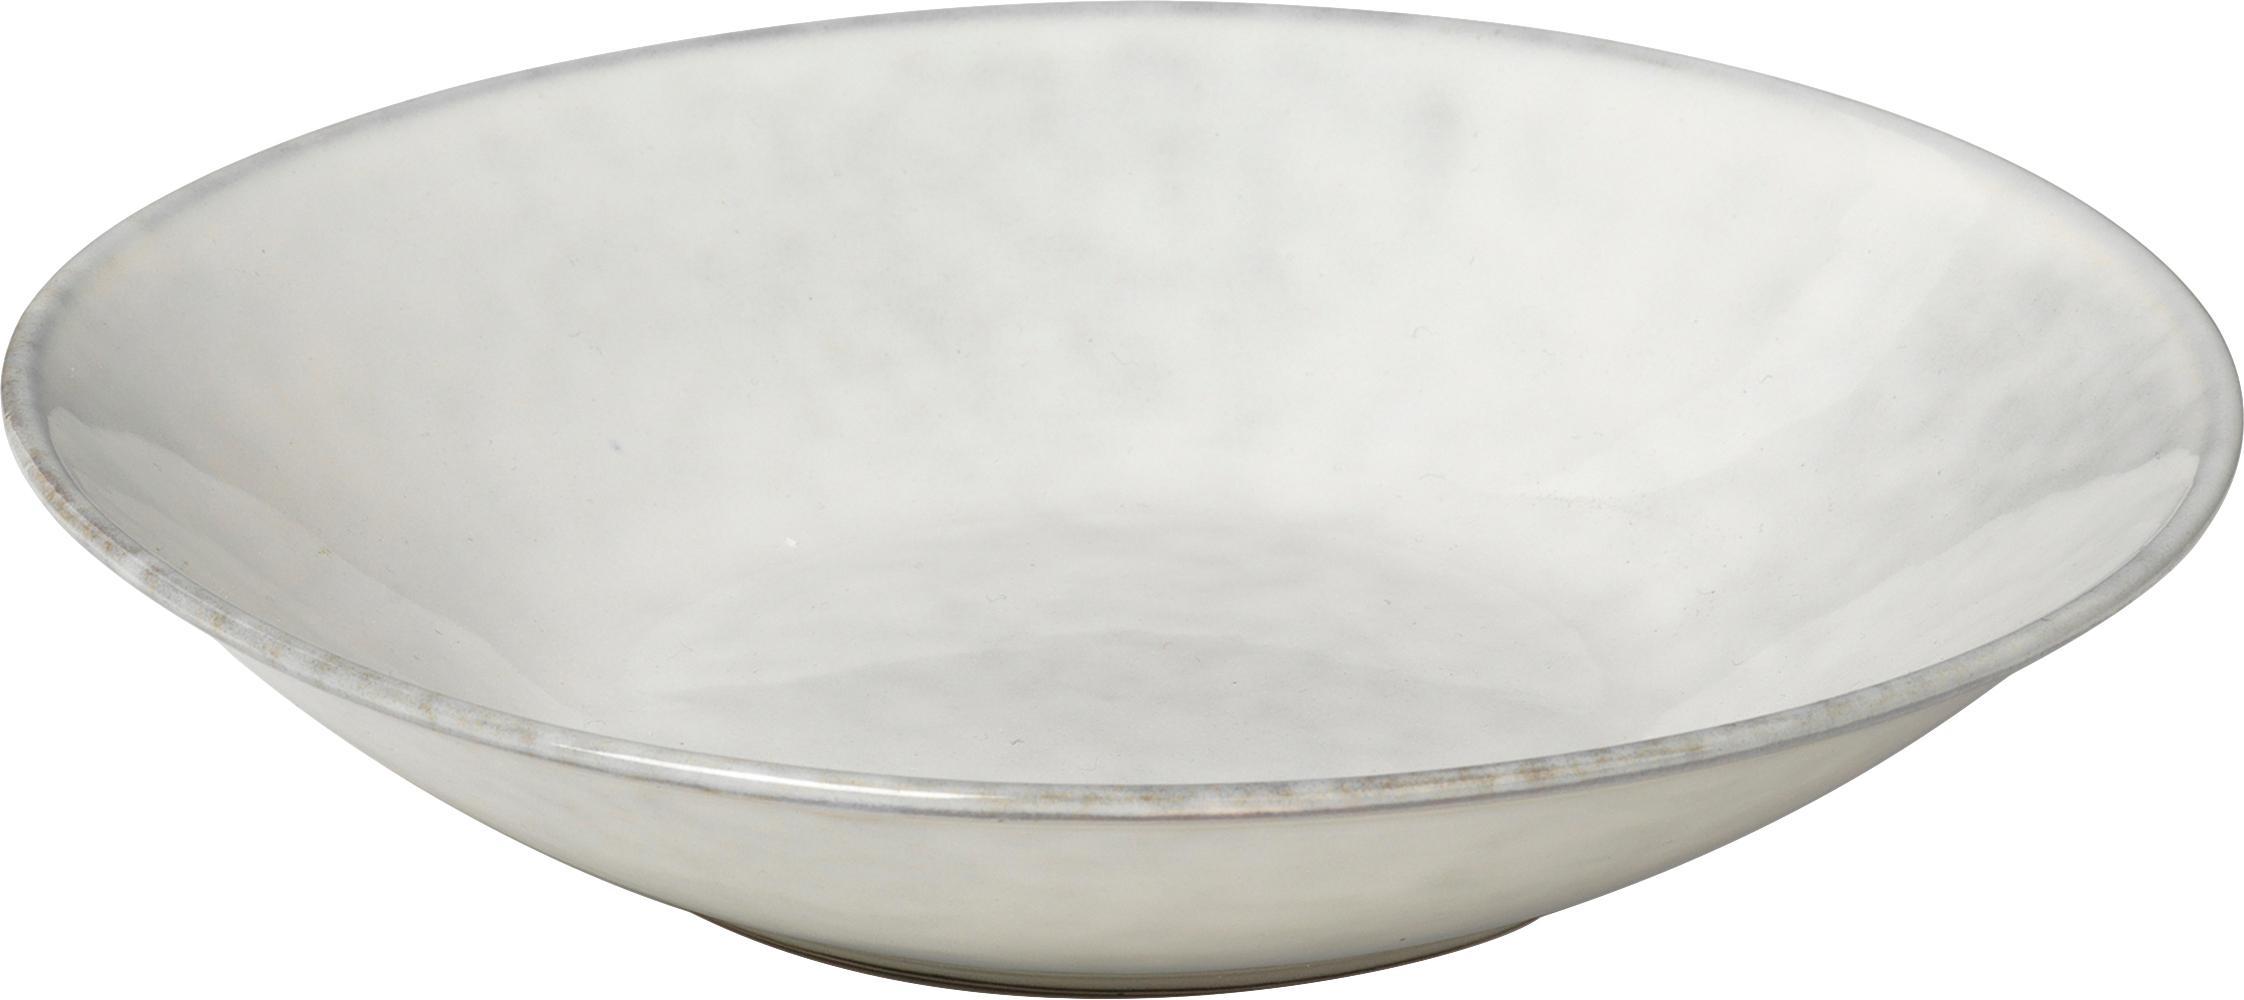 Handgemaakte soepborden Nordic Sand, 4 stuks, Keramiek, Zandkleurig, Ø 22 x H 5 cm